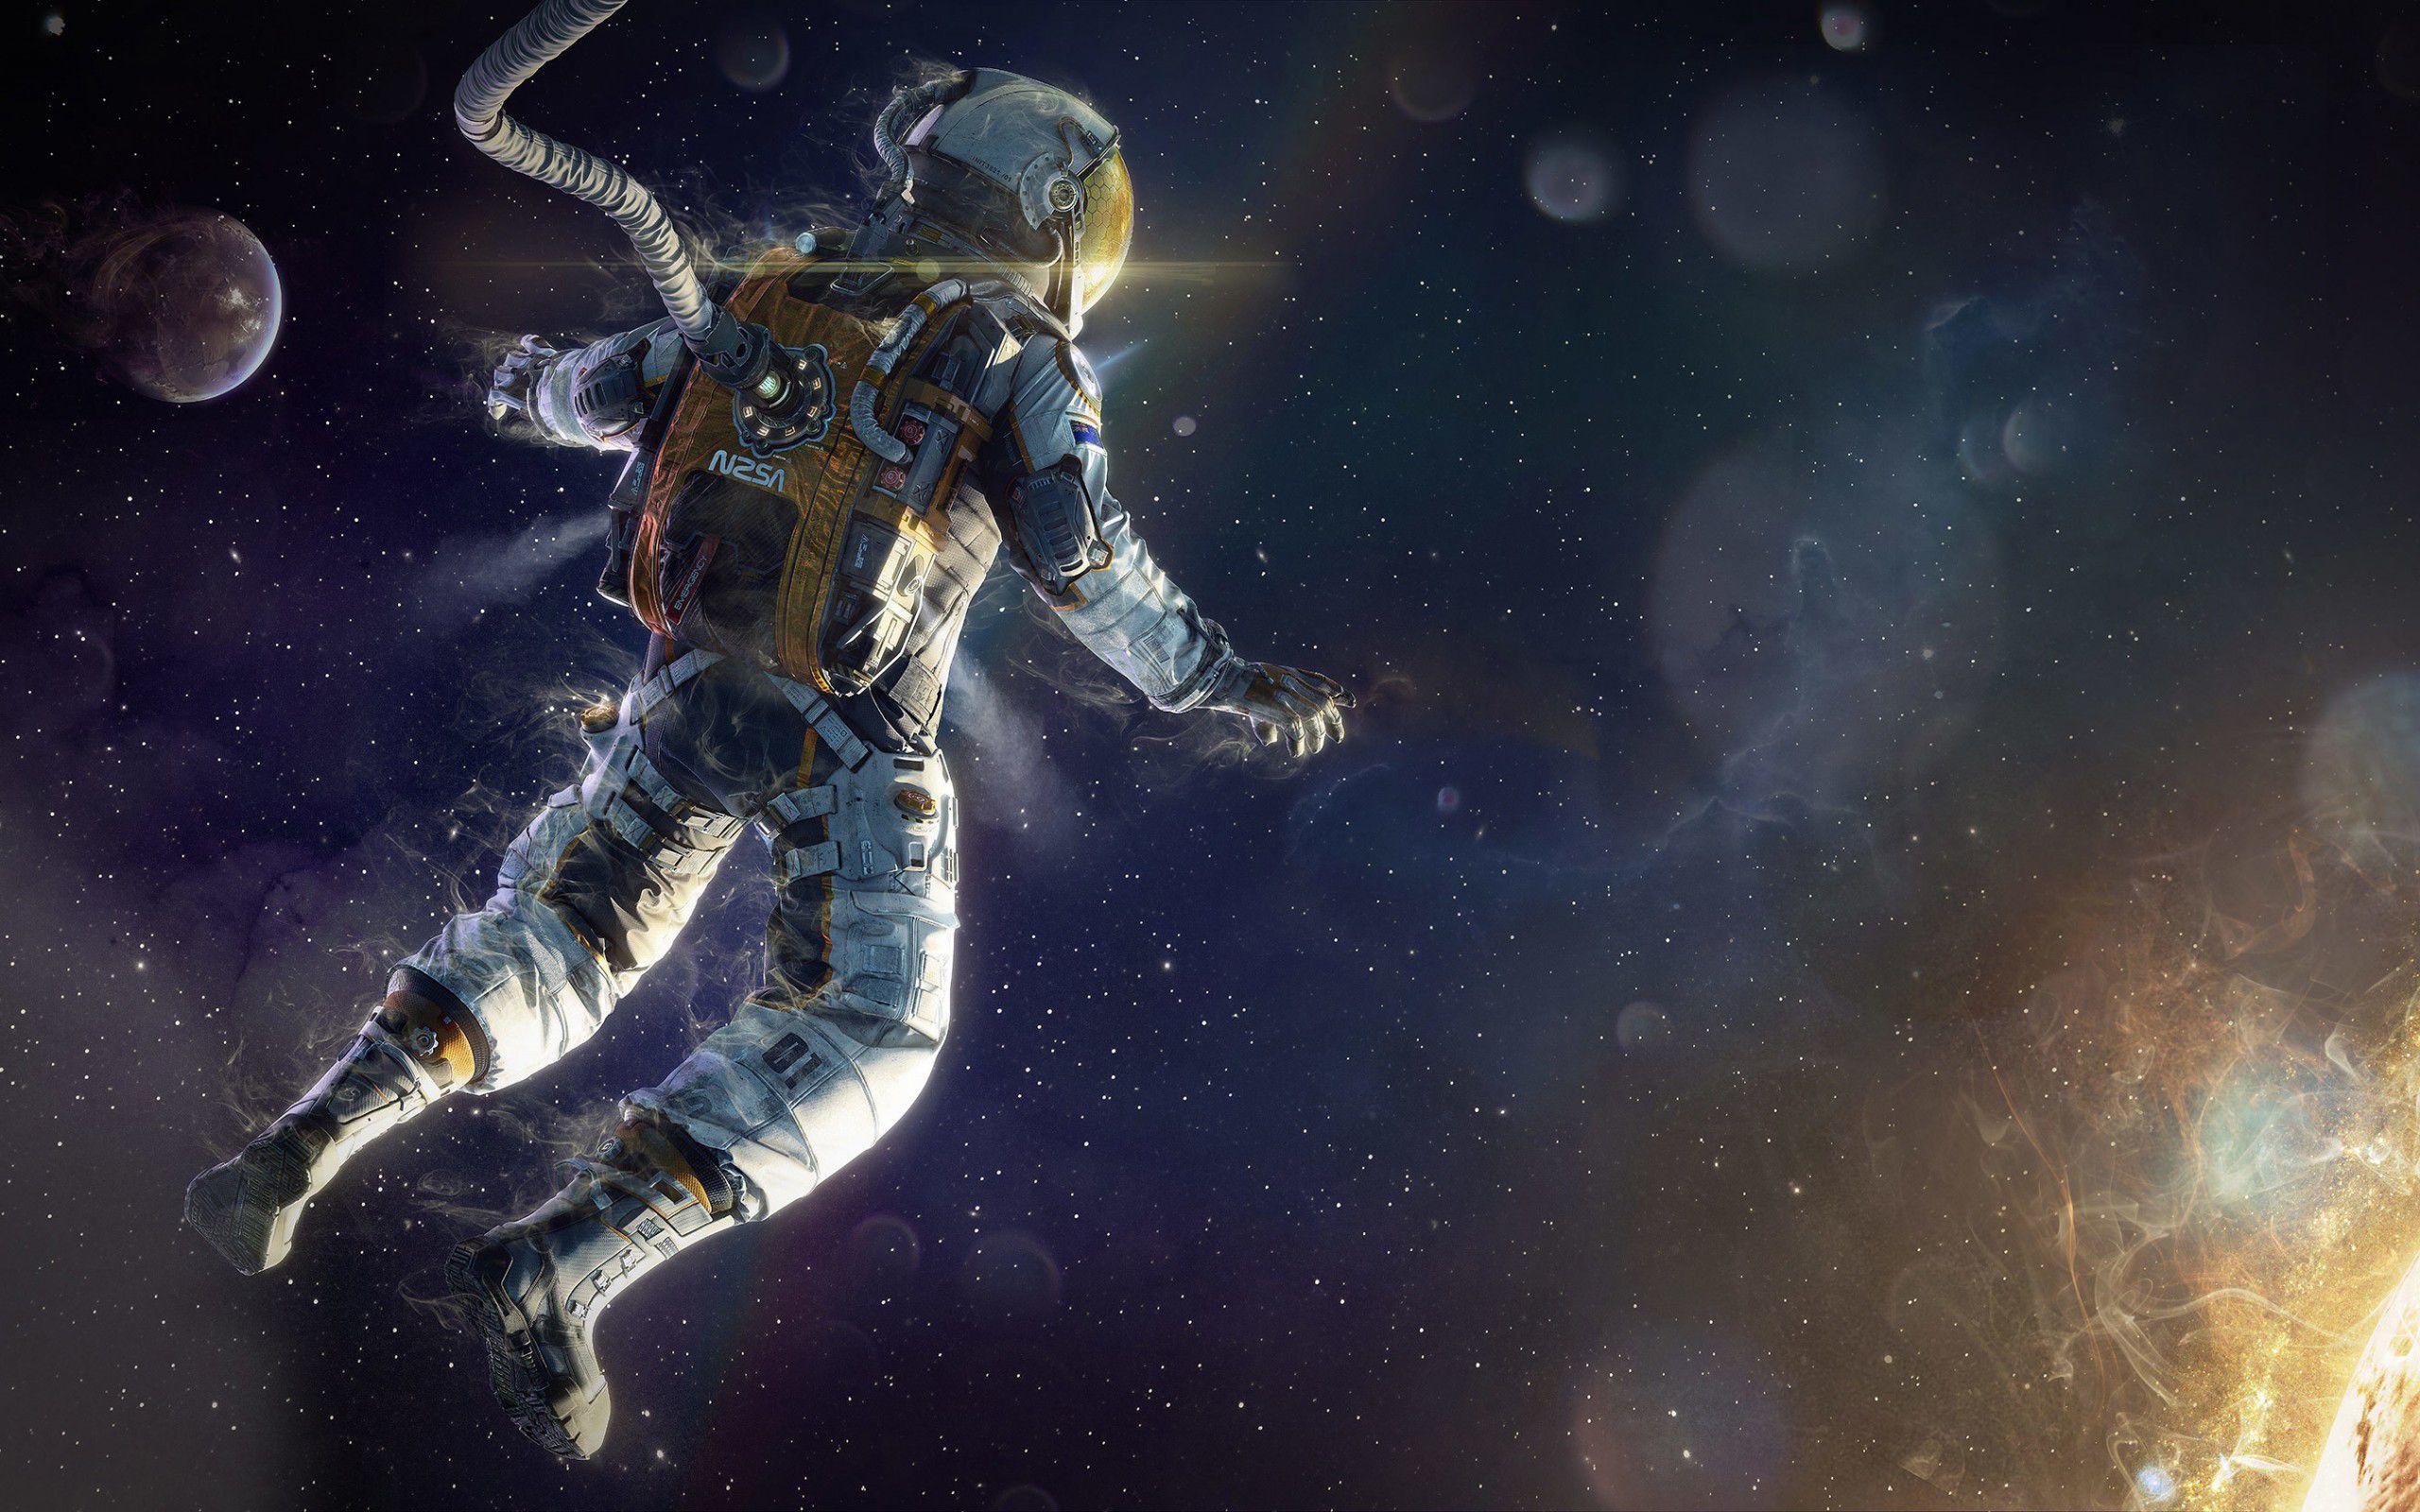 Astronaut Wallpapers   Top Astronaut Backgrounds 2560x1600